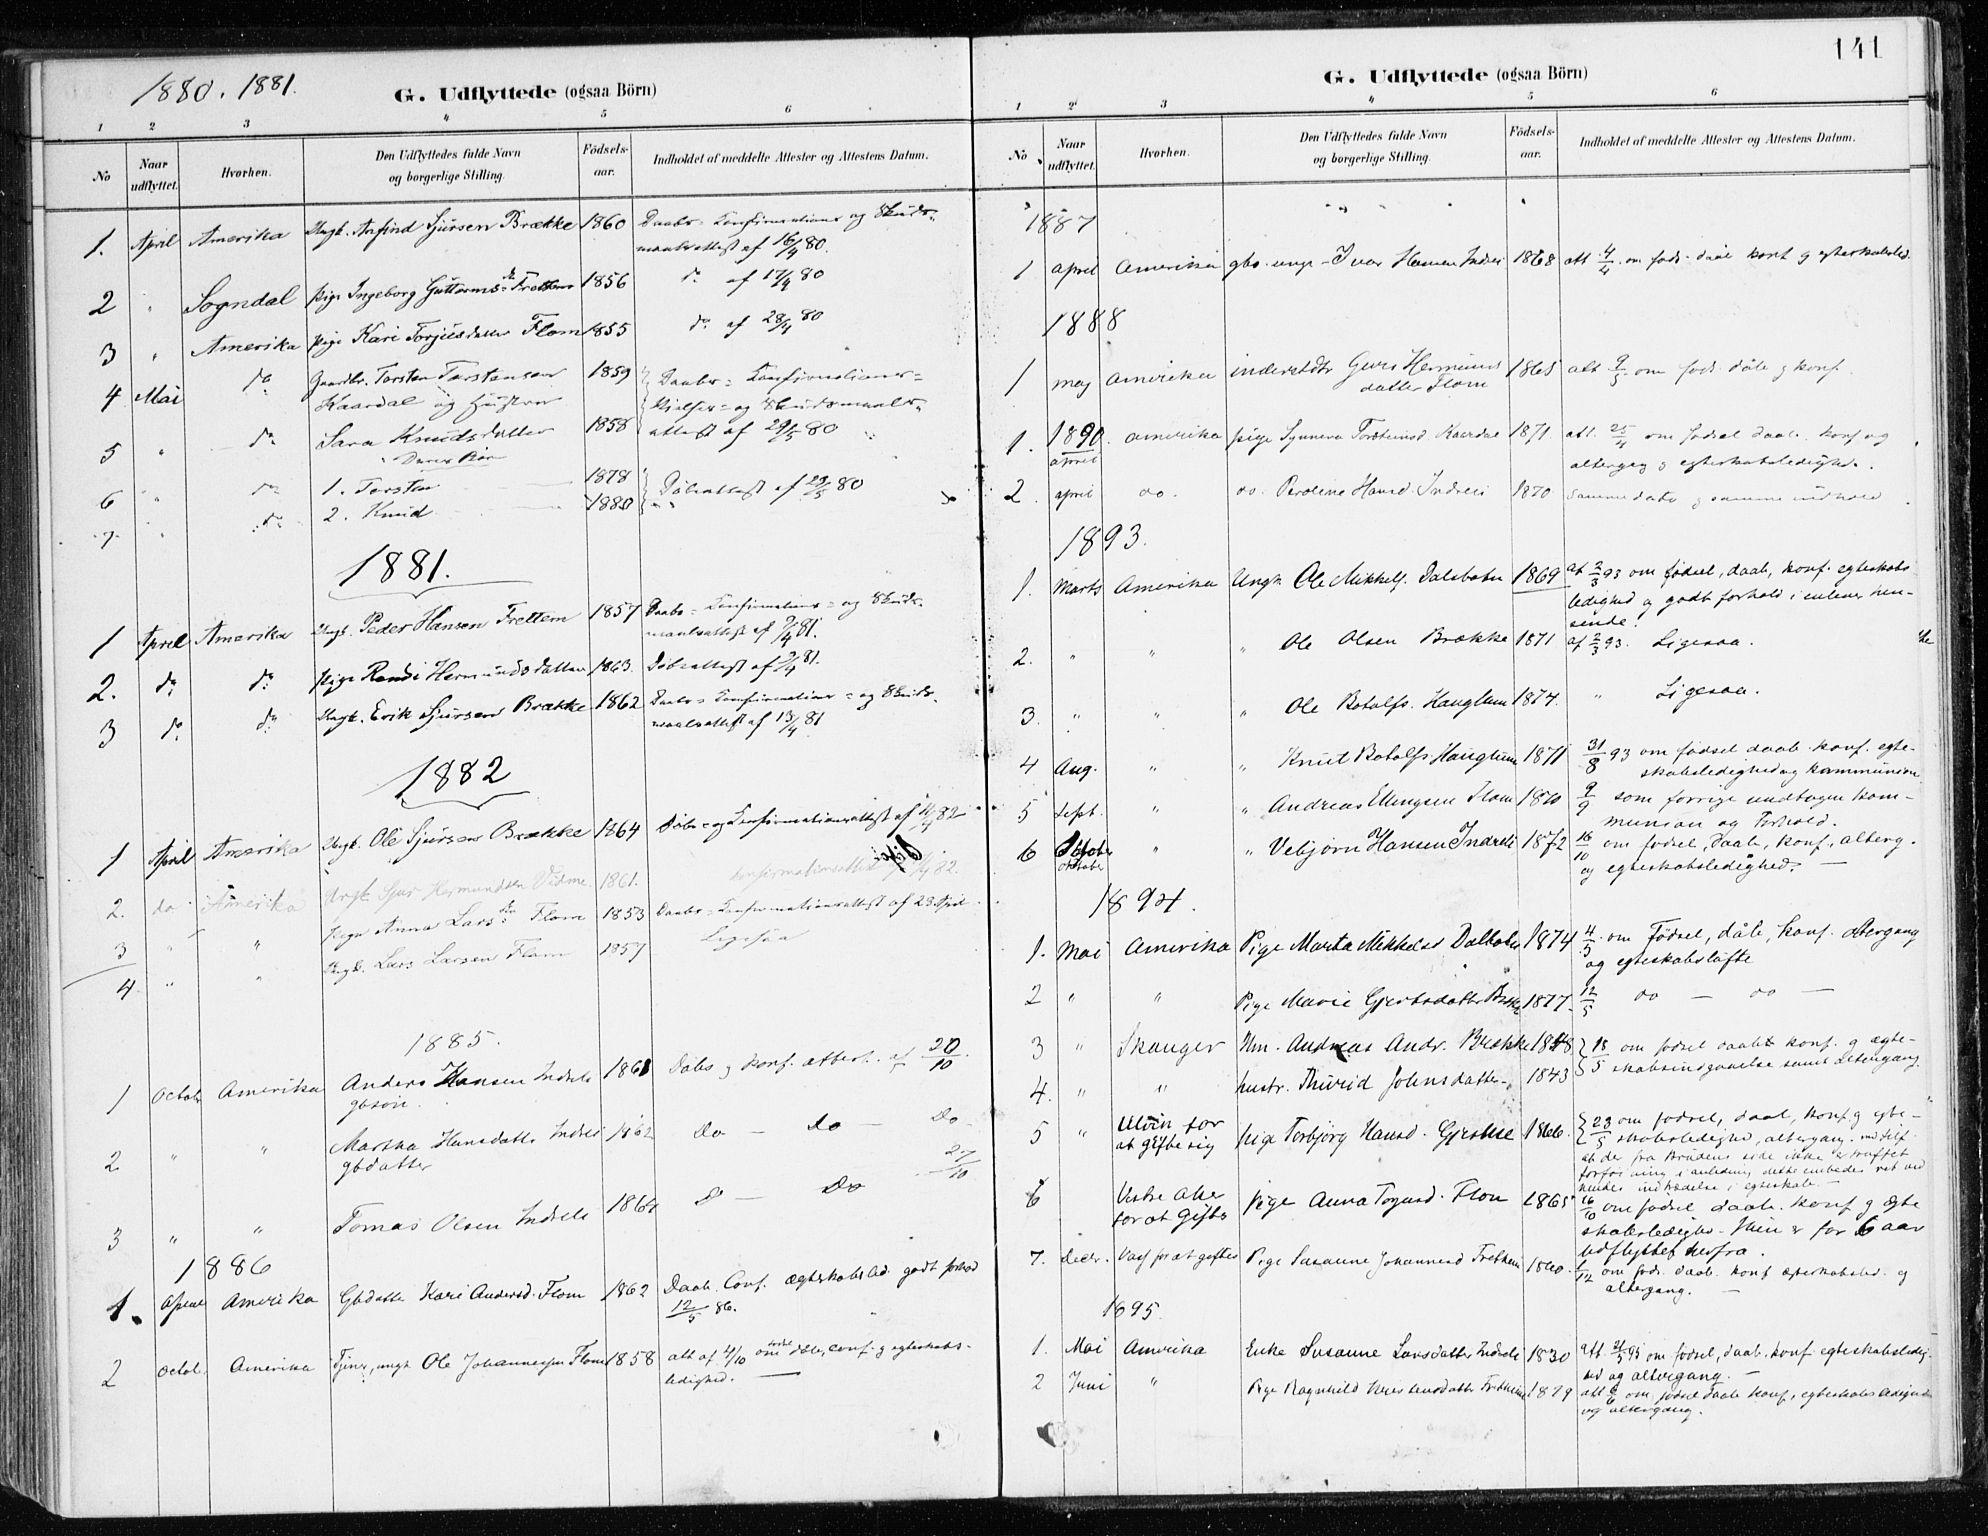 SAB, Aurland Sokneprestembete*, Ministerialbok nr. C 1, 1880-1921, s. 141